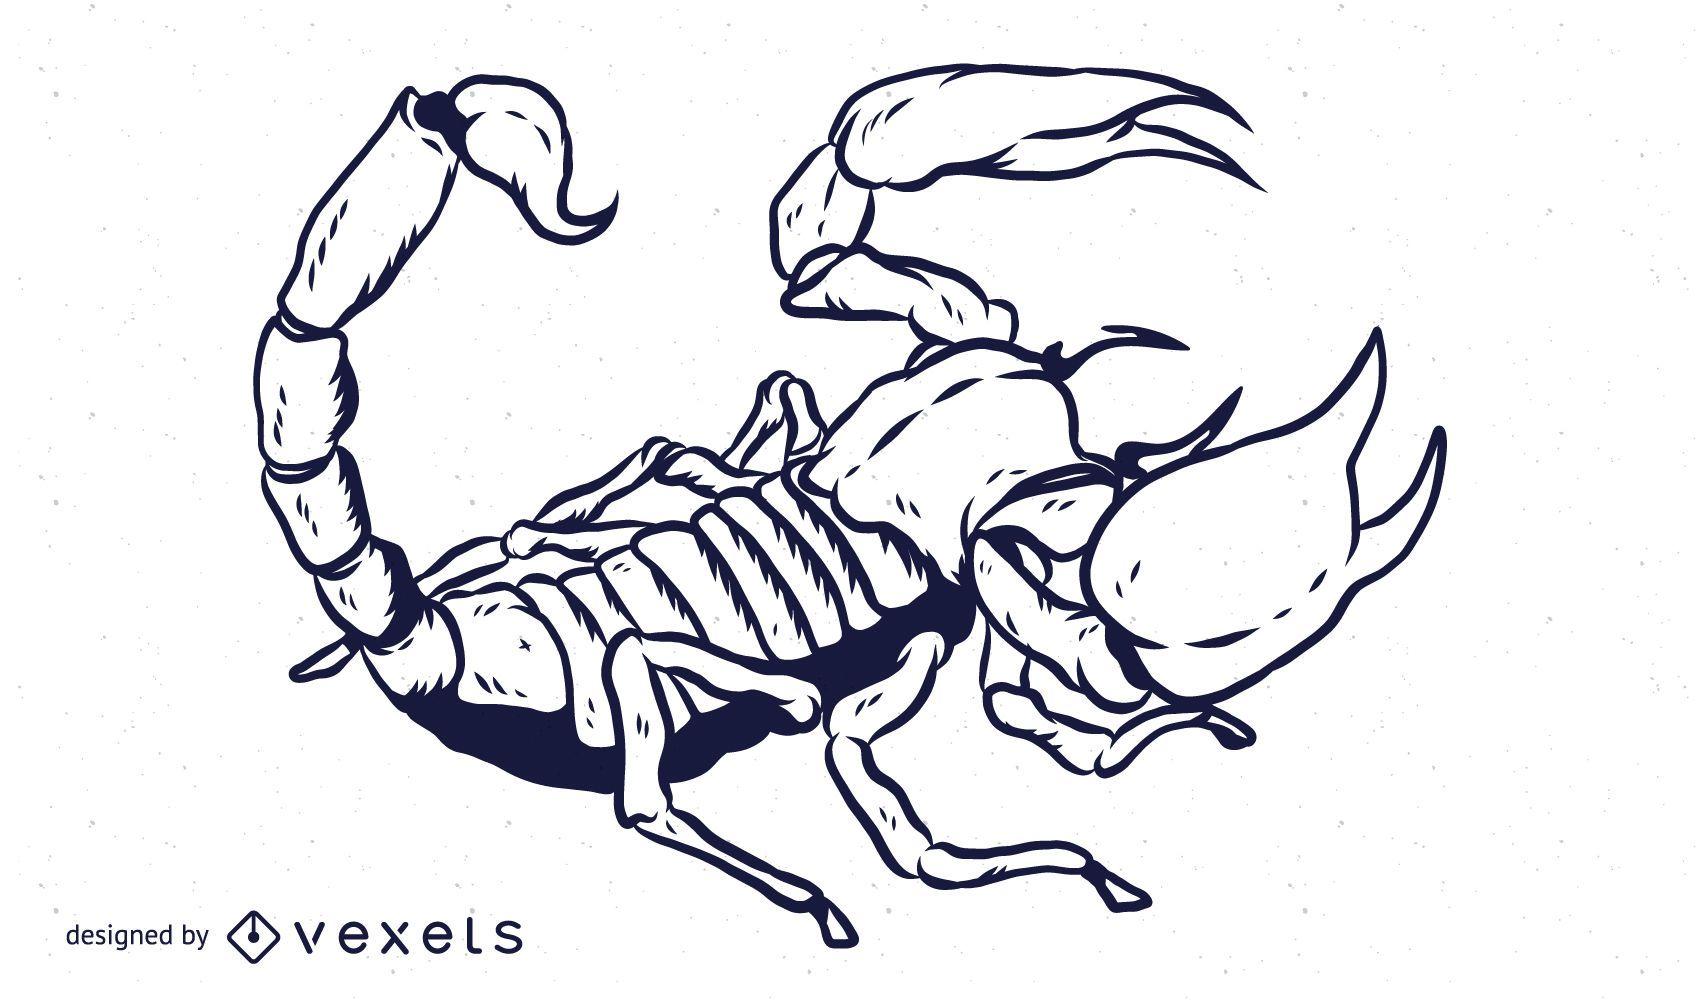 Scorpion Hand Drawn Outline Design